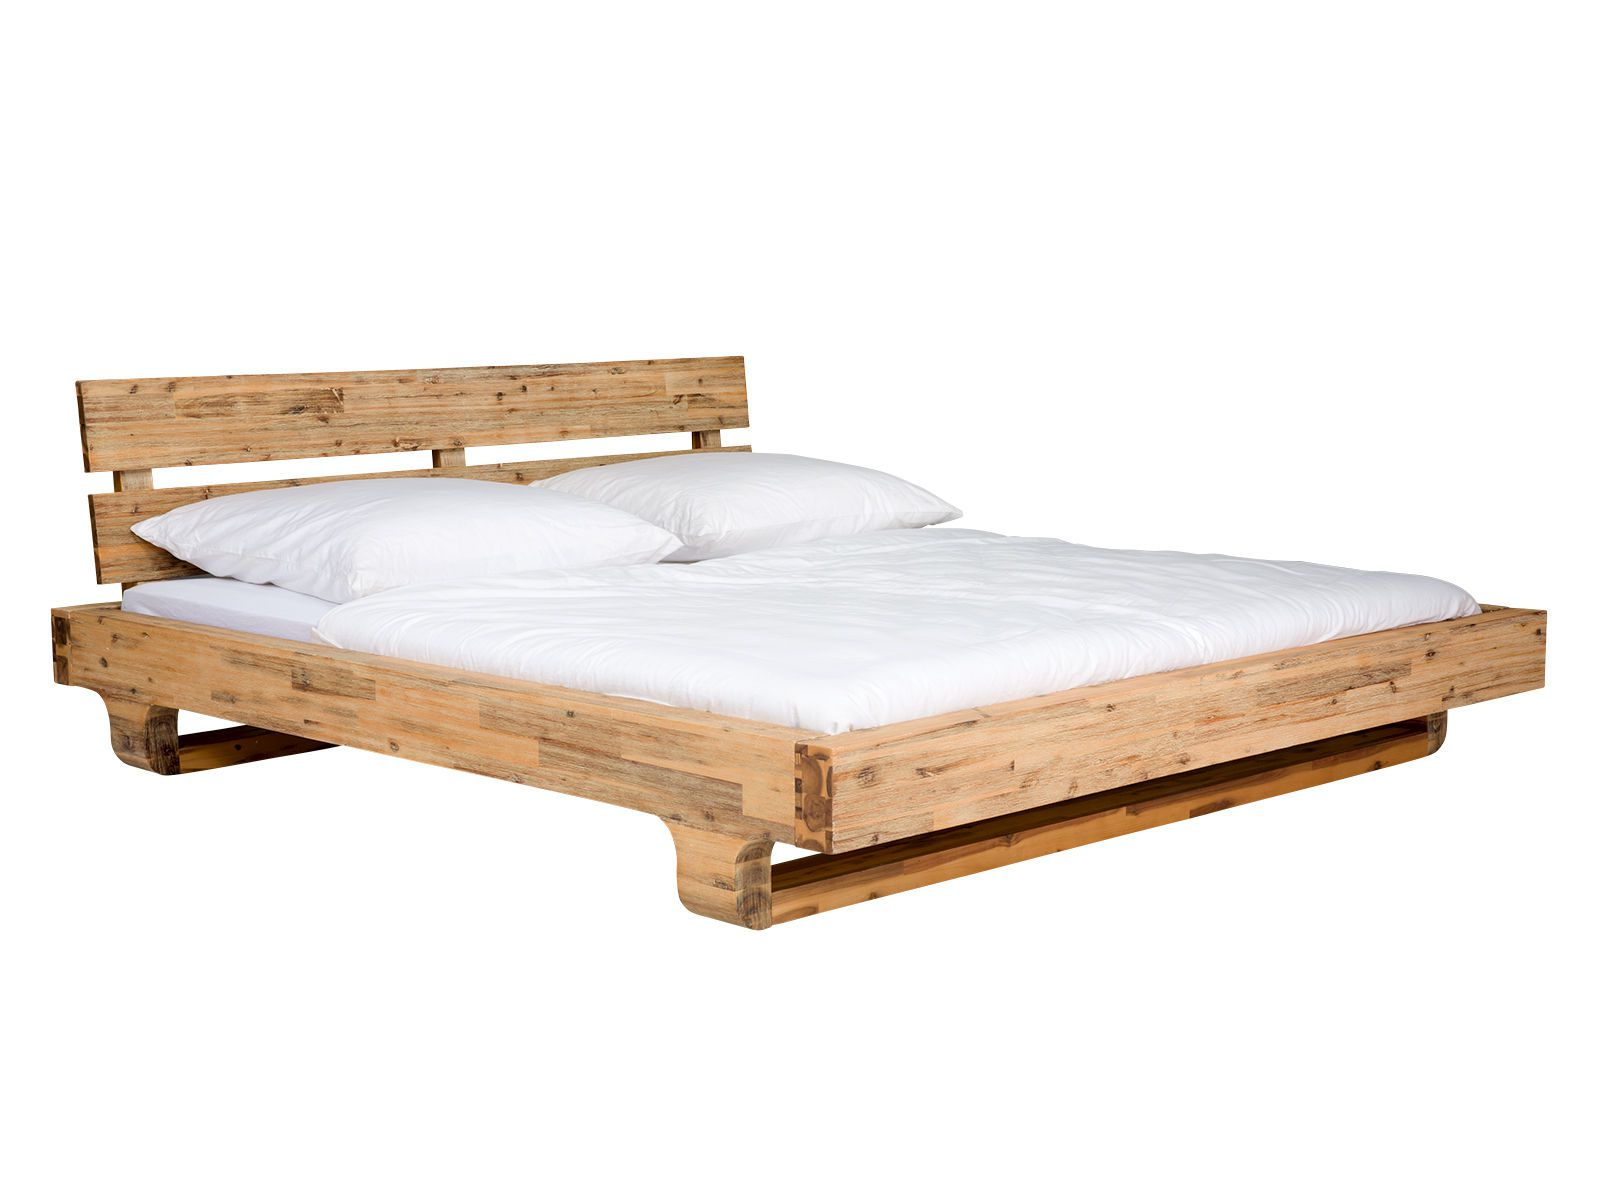 Full Size of Bett 180x200 Günstig Holzbetten Kaufen Massivholzbetten Bettgestelle Massivum Schlafzimmer Betten 140 Tagesdecke Pinolino Himmel Küche Mit Bettkasten Schrank Bett Bett 180x200 Günstig